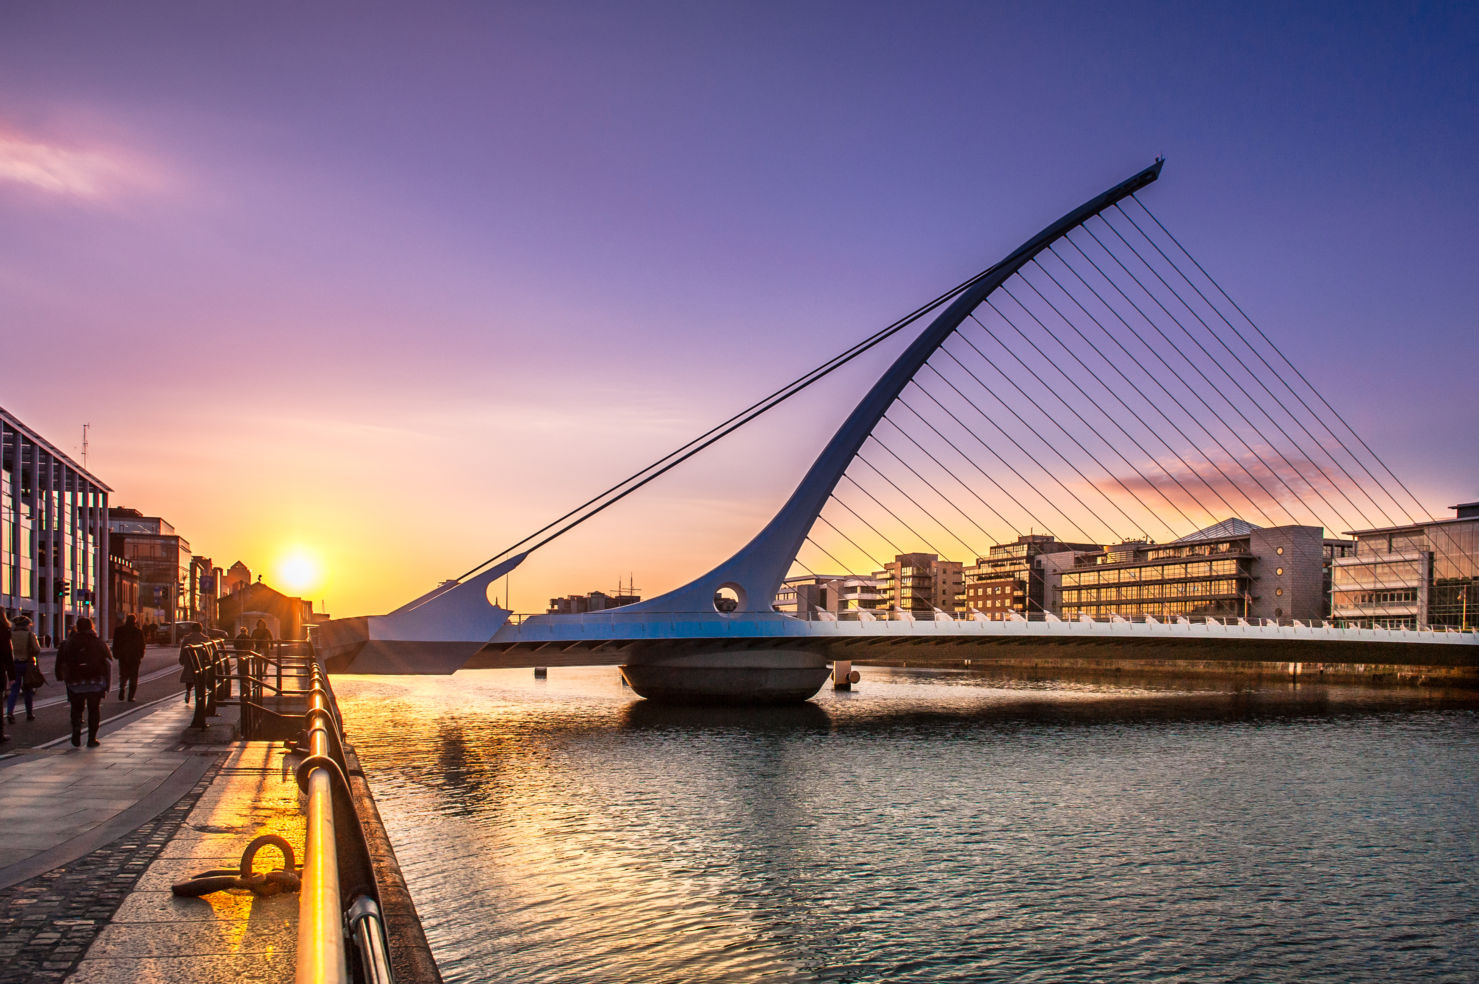 harp shaped, Samuel Beckett Bridge, Liffey river, Dublin, Ireland